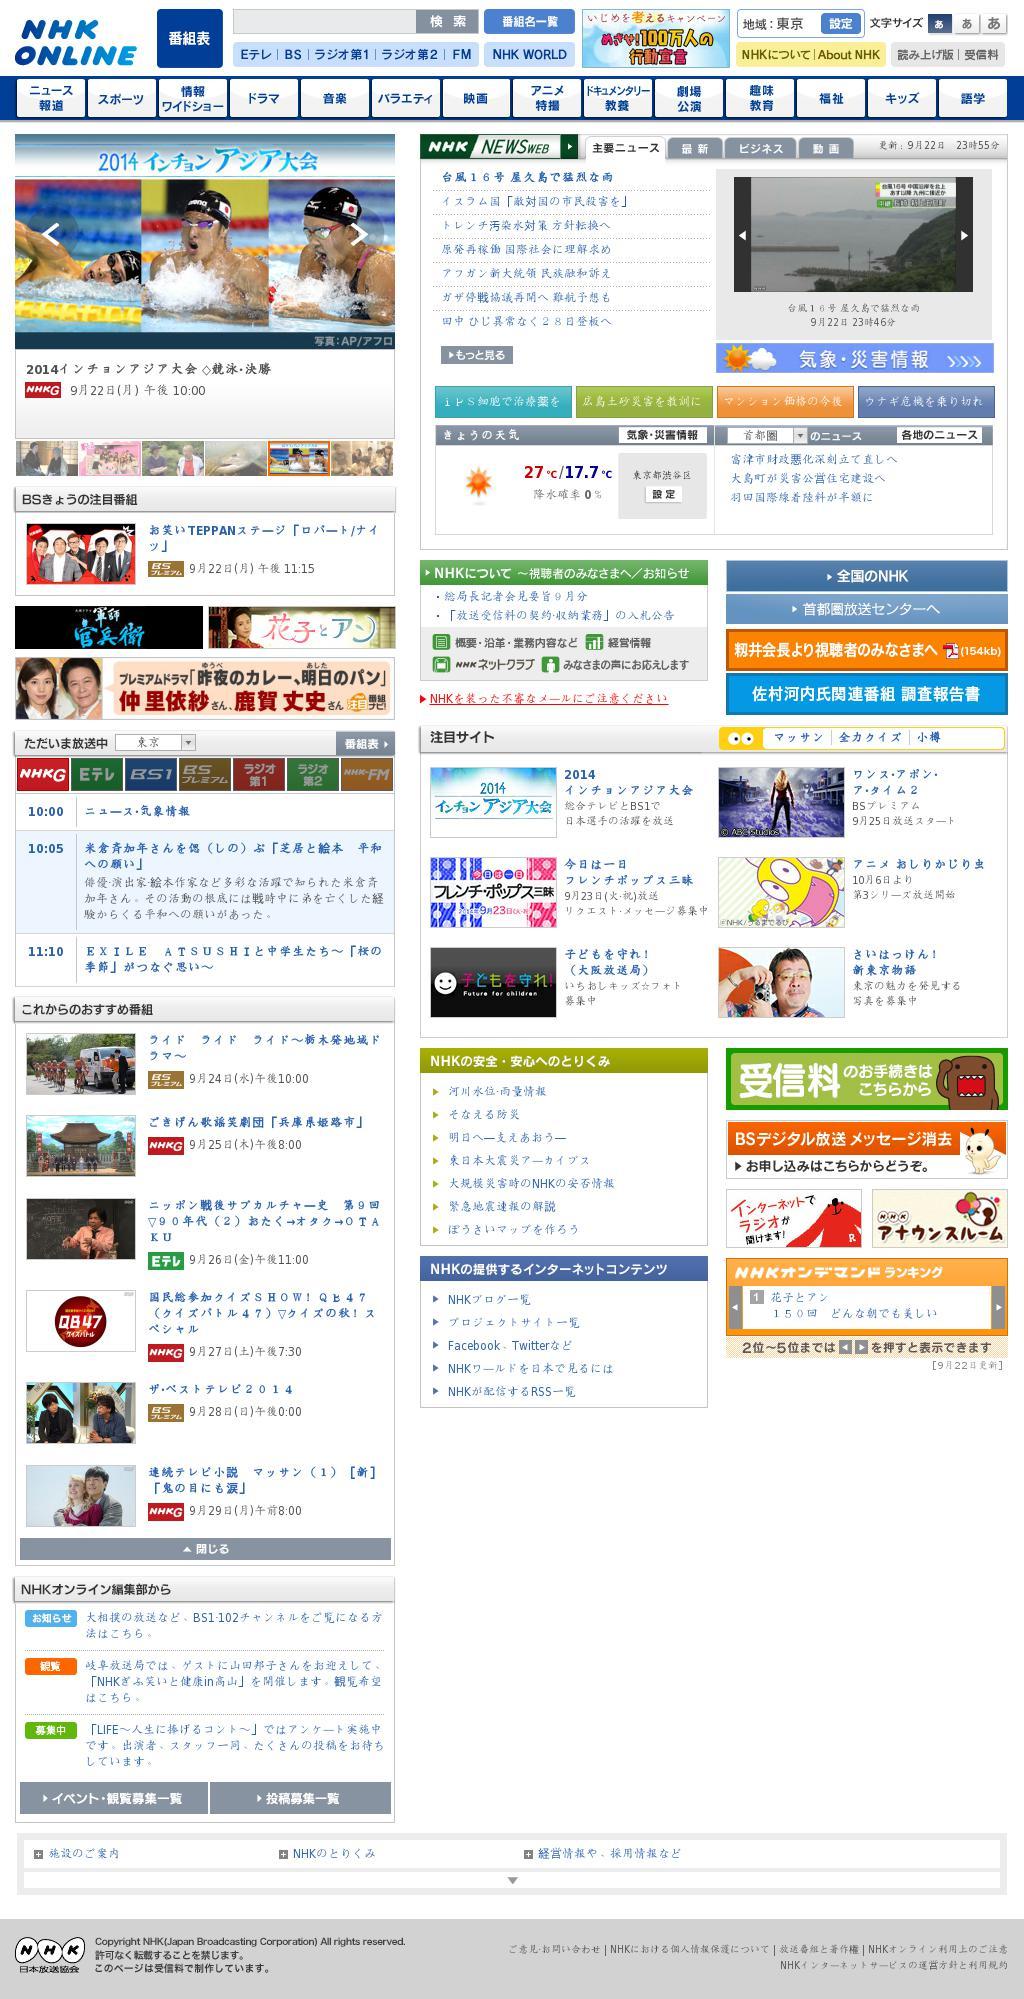 NHK Online at Tuesday Sept. 23, 2014, 1:14 a.m. UTC